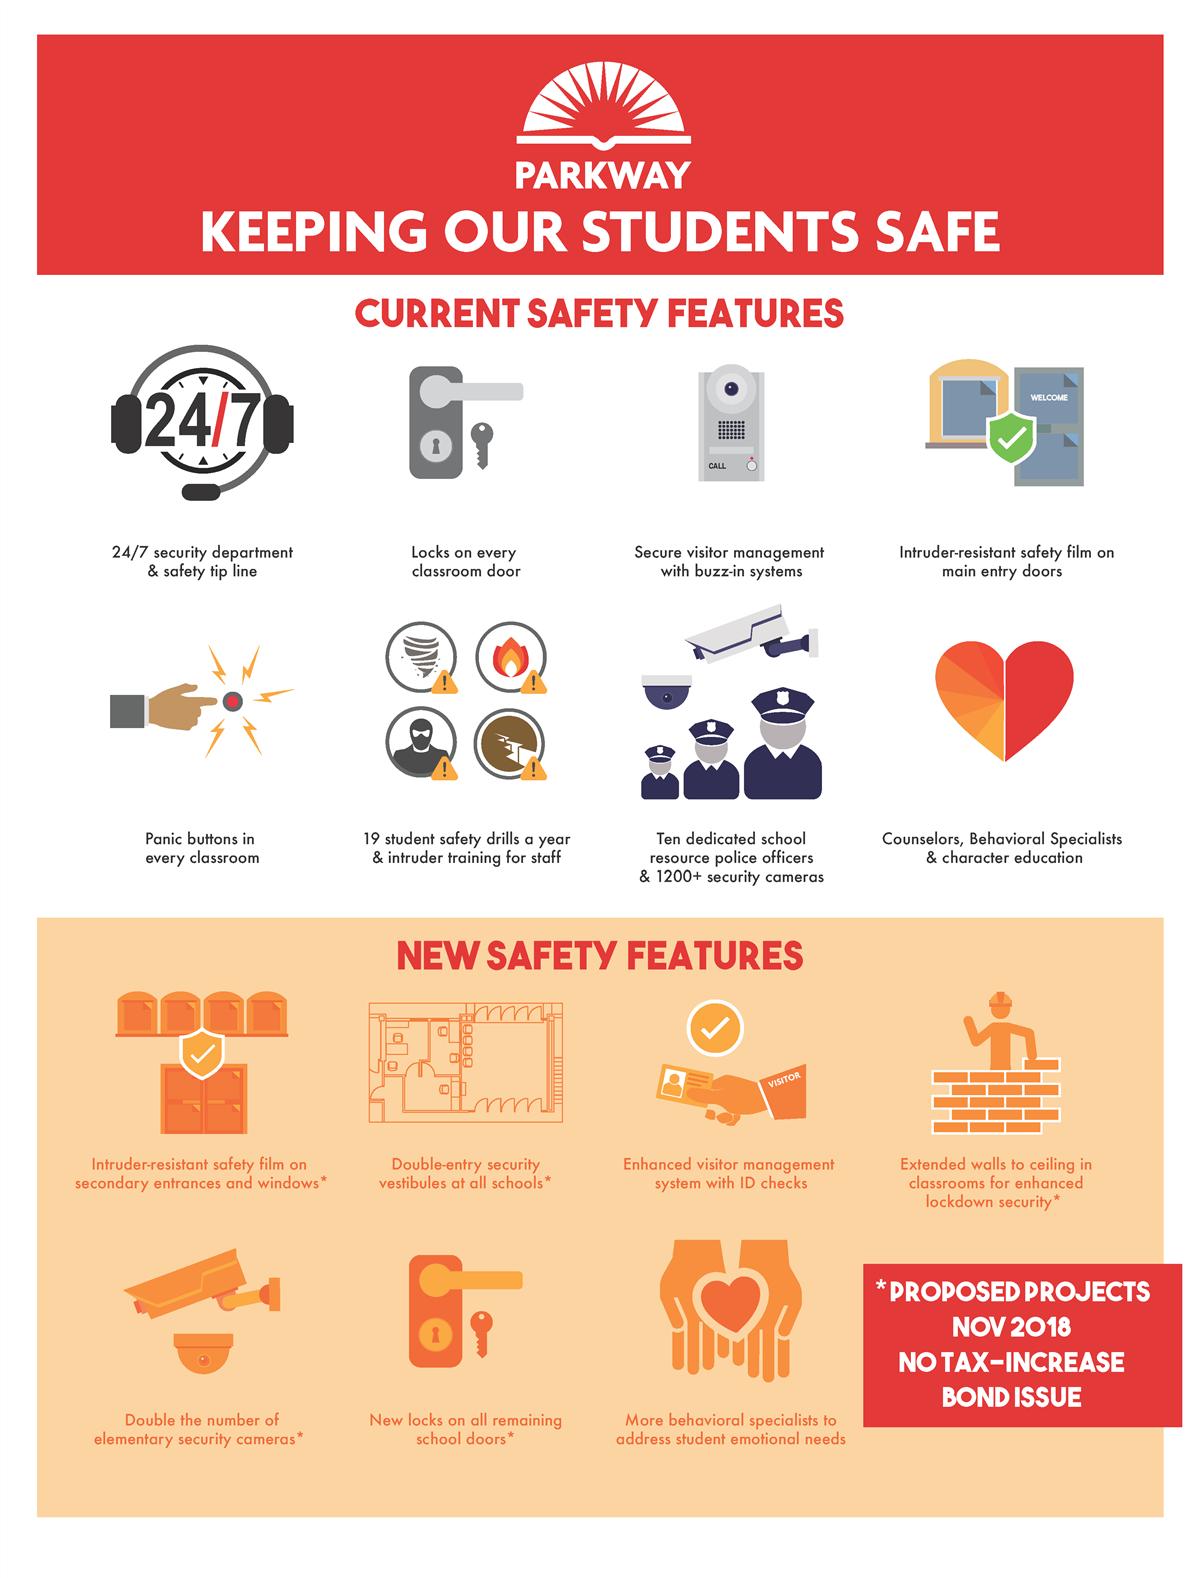 Security / Keeping Children Safe